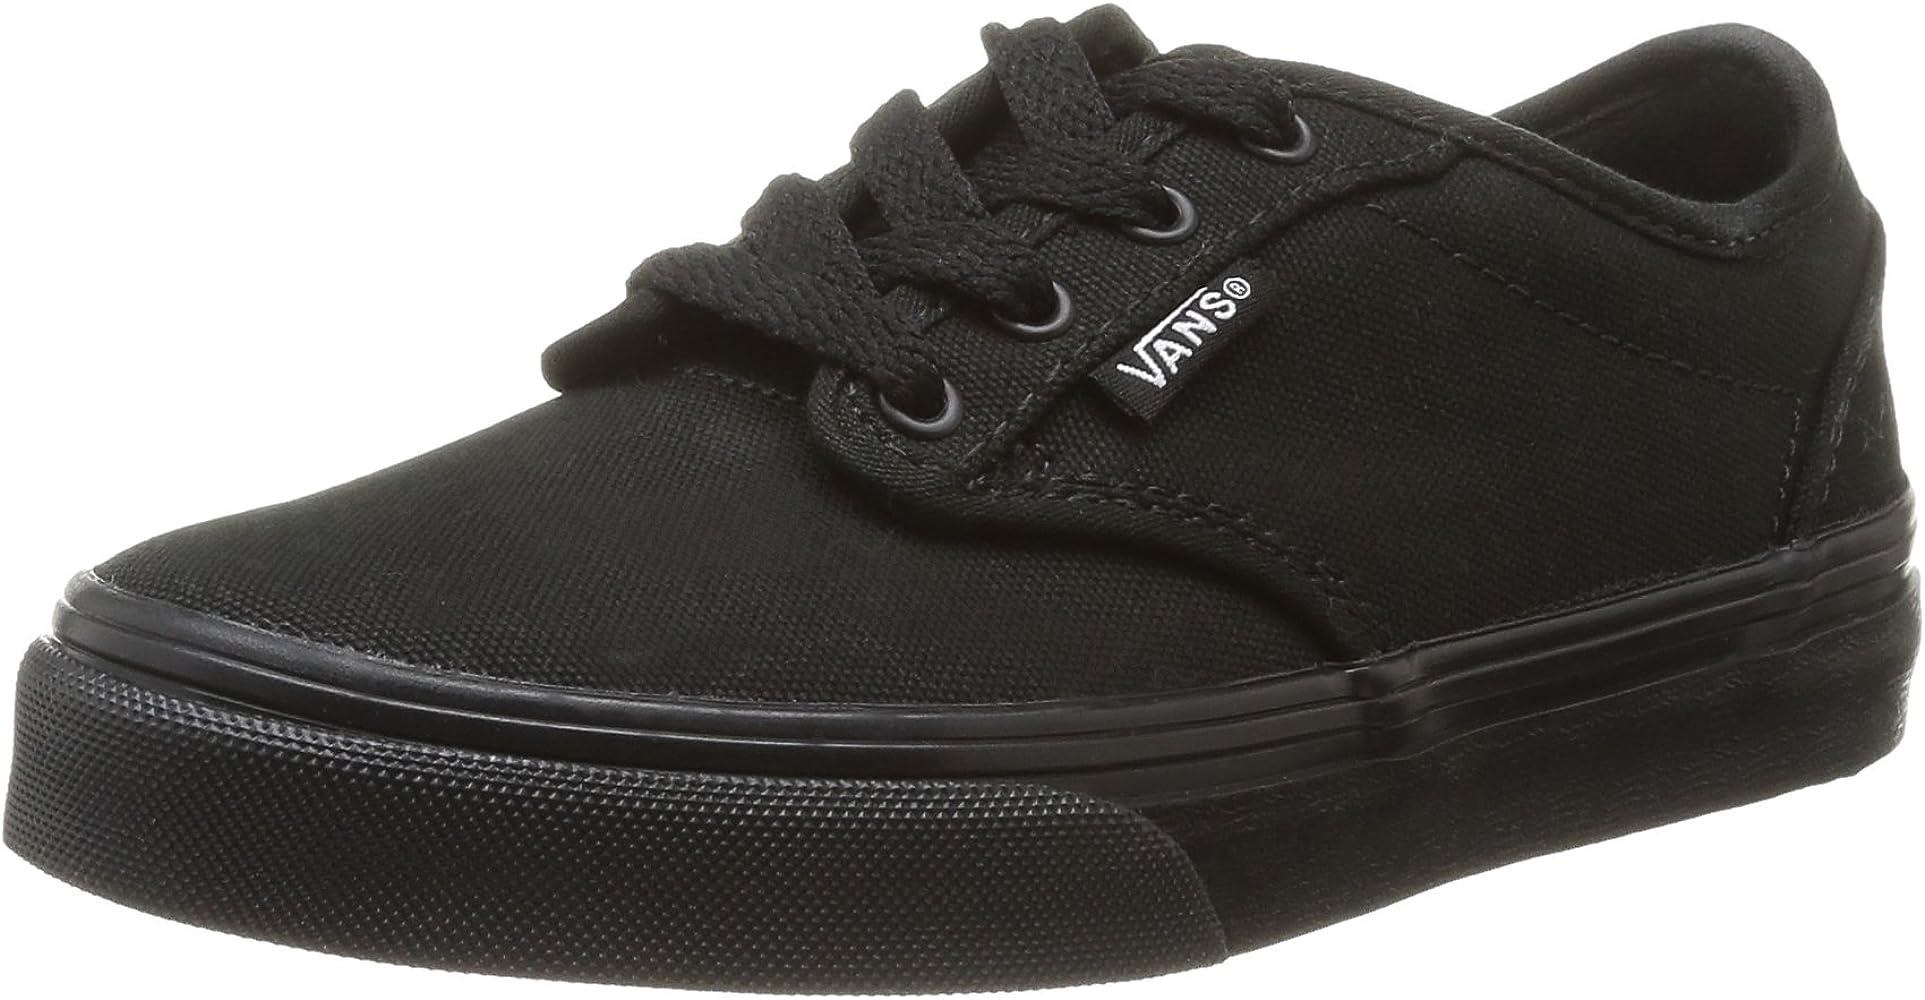 Vans Atwood, Unisex-Kinder Sneakers, Schwarz ((Canvas) Black/ 186 ...